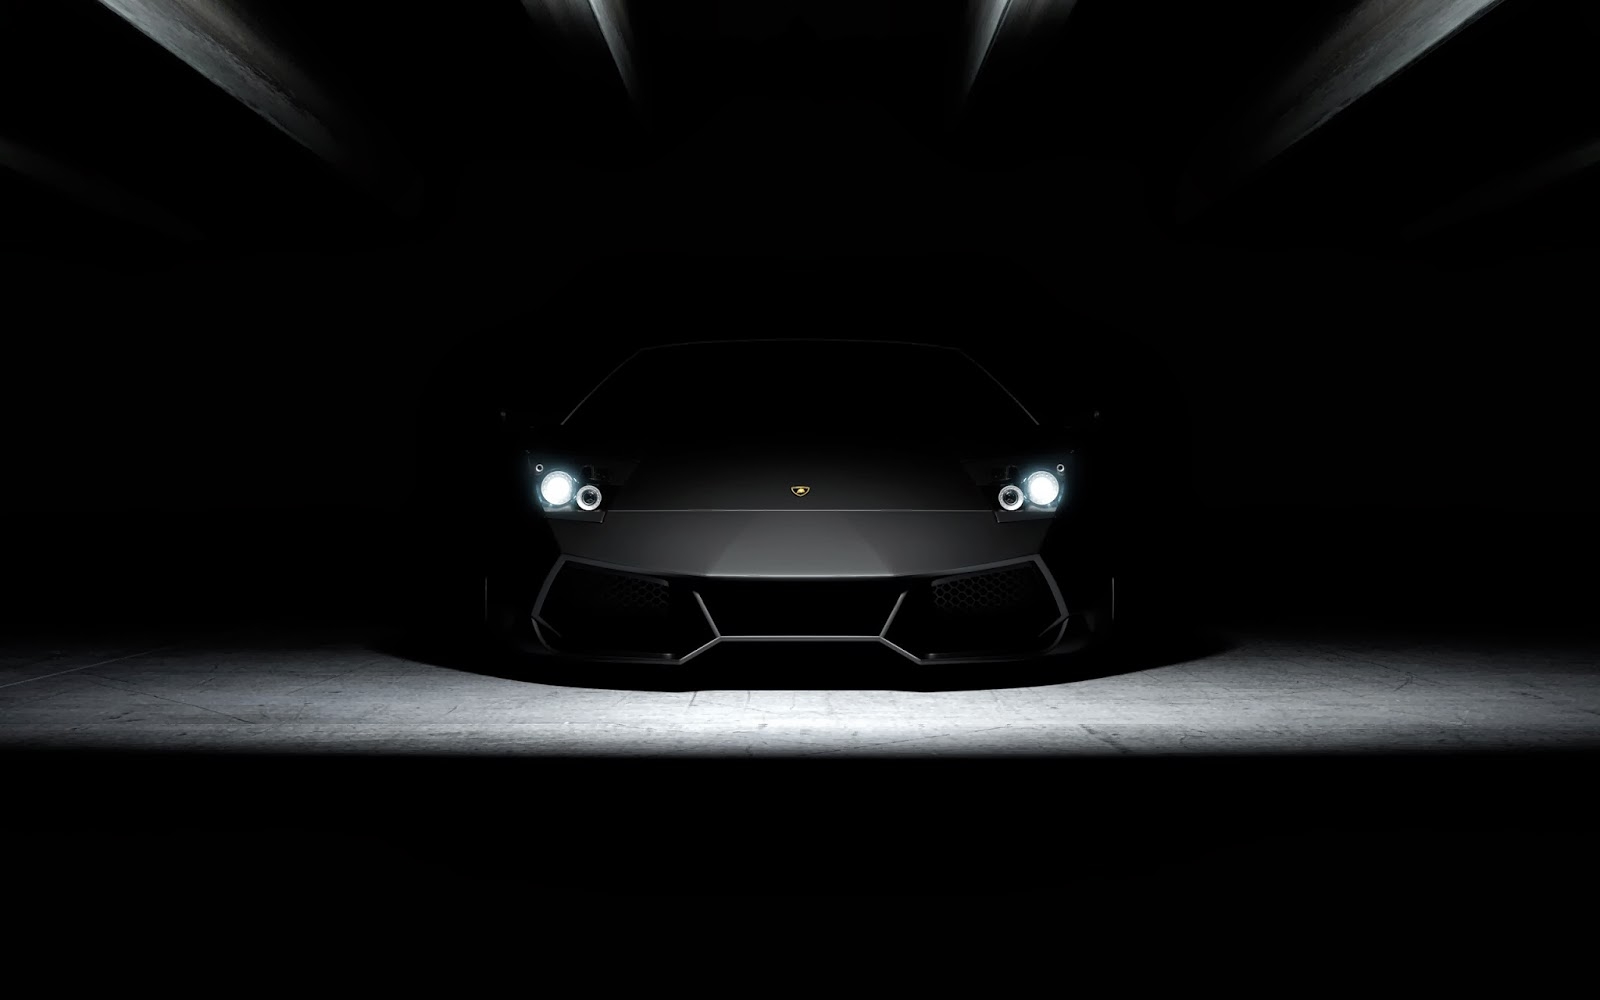 Lamborghini Diablo Negro Fondos De Pantalla Hd